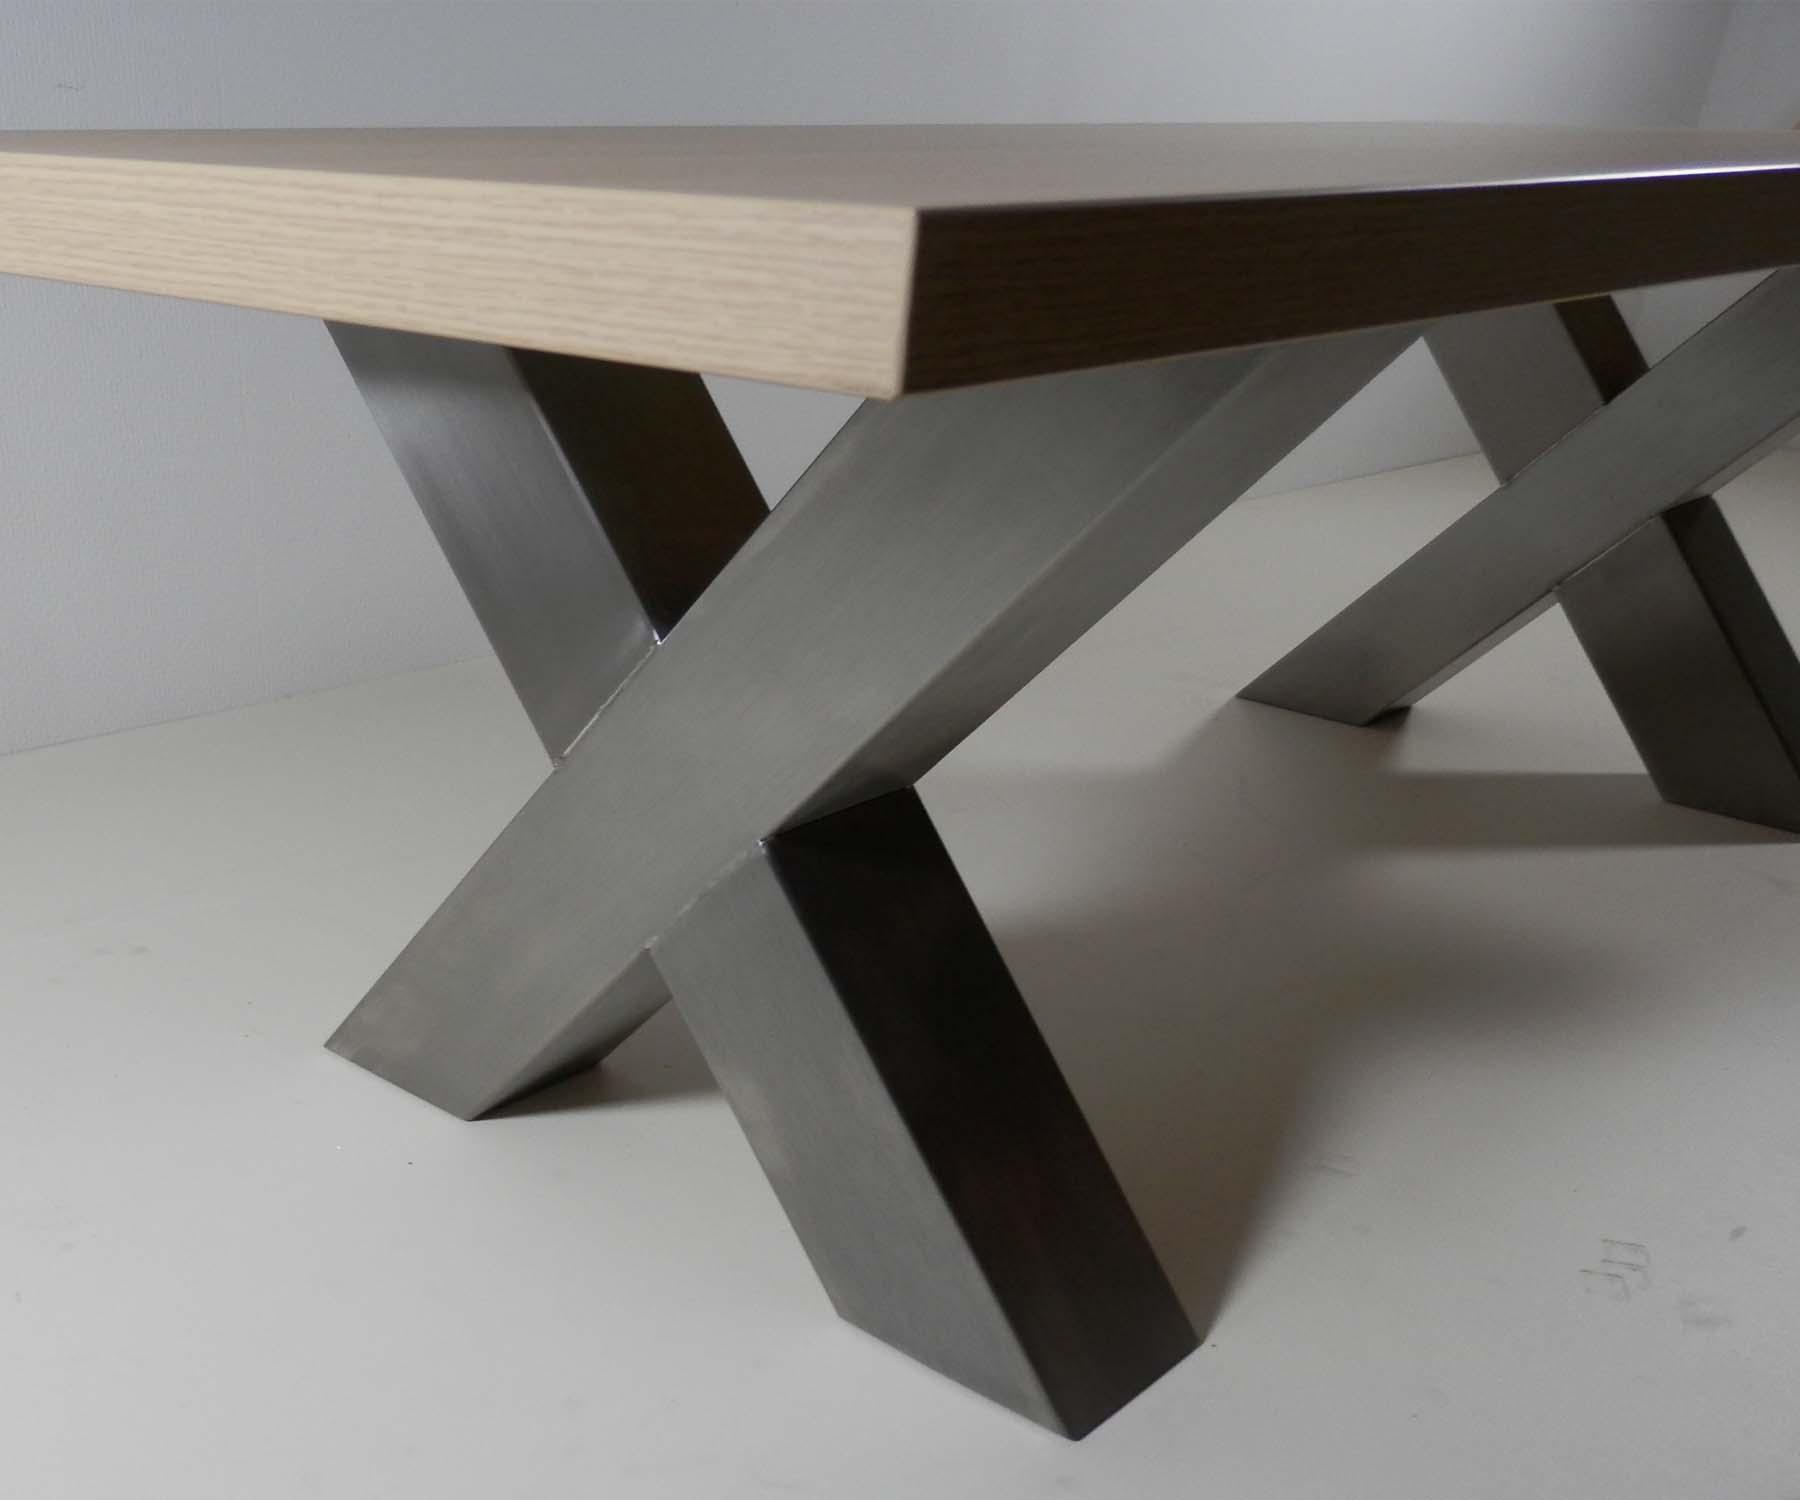 RVS tafelpoten